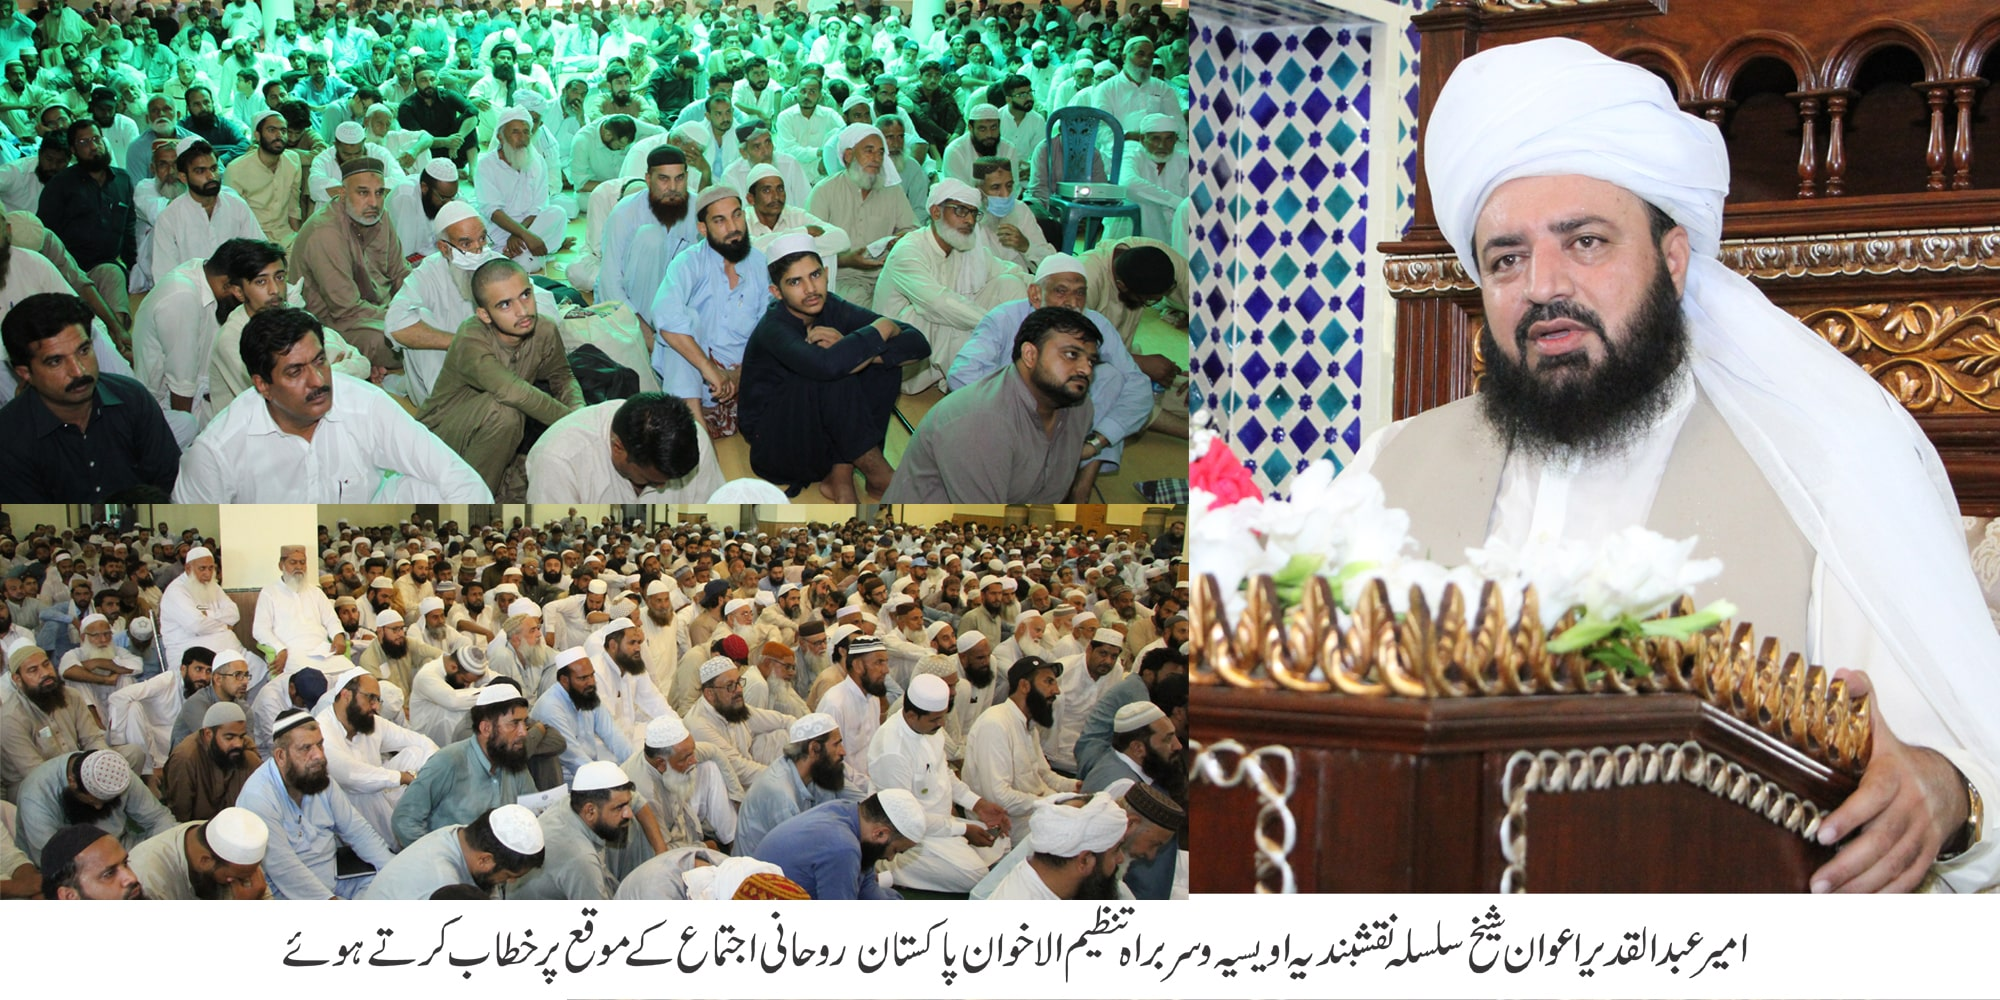 Umt-e- Musalmah aaj ilaaj se le kar dunyawi zaroriat tak ghair muslim ki mohtaaj hai - 1